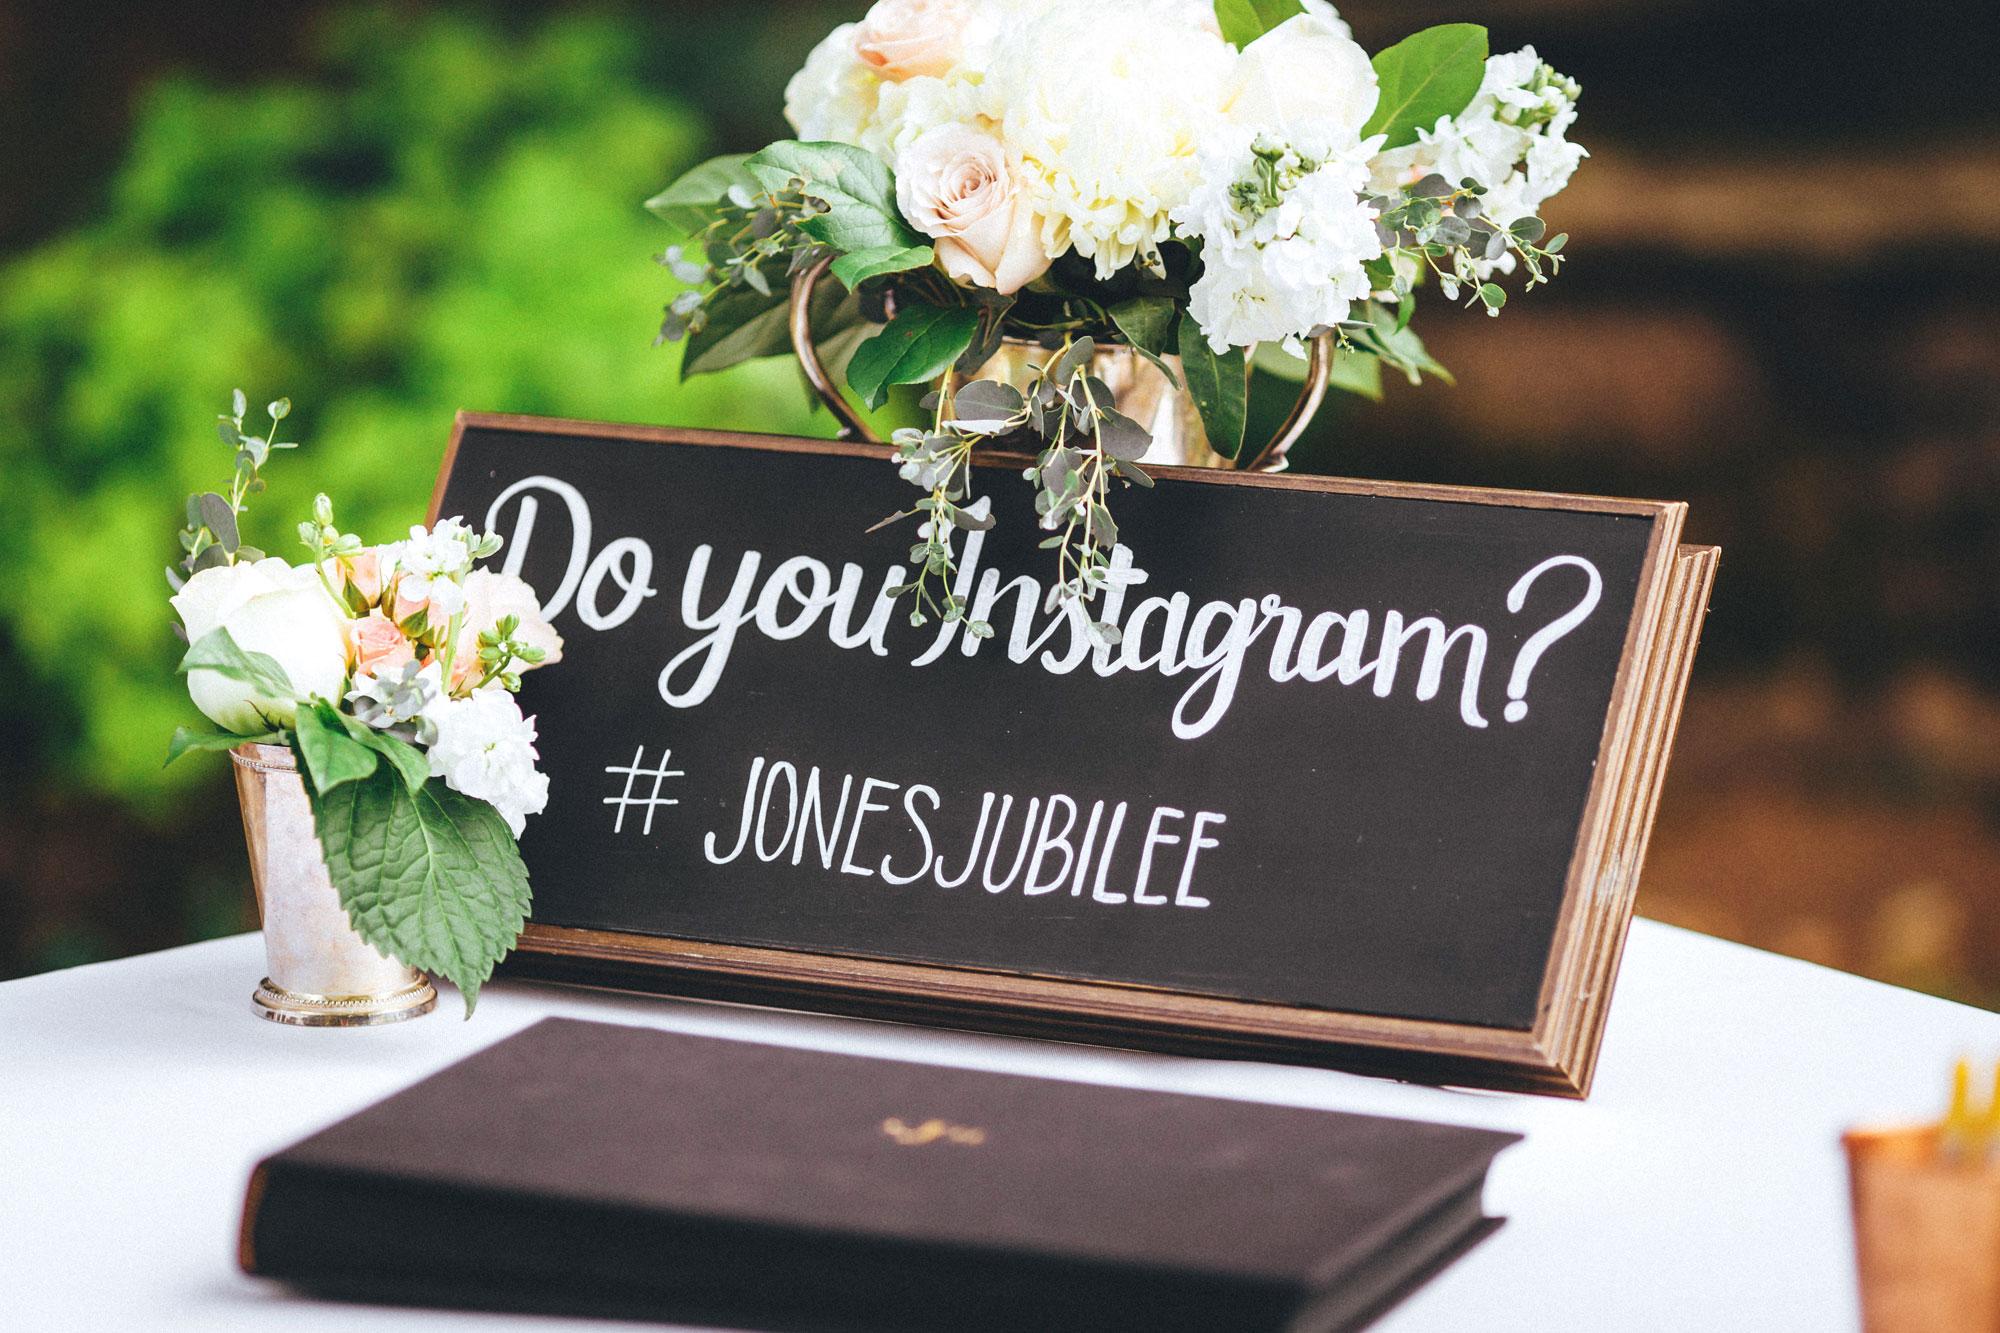 Me & Mr. Jones Wedding, Black Tie Wedding, Chalkboard Instagram Sign, Mint Julep Vases